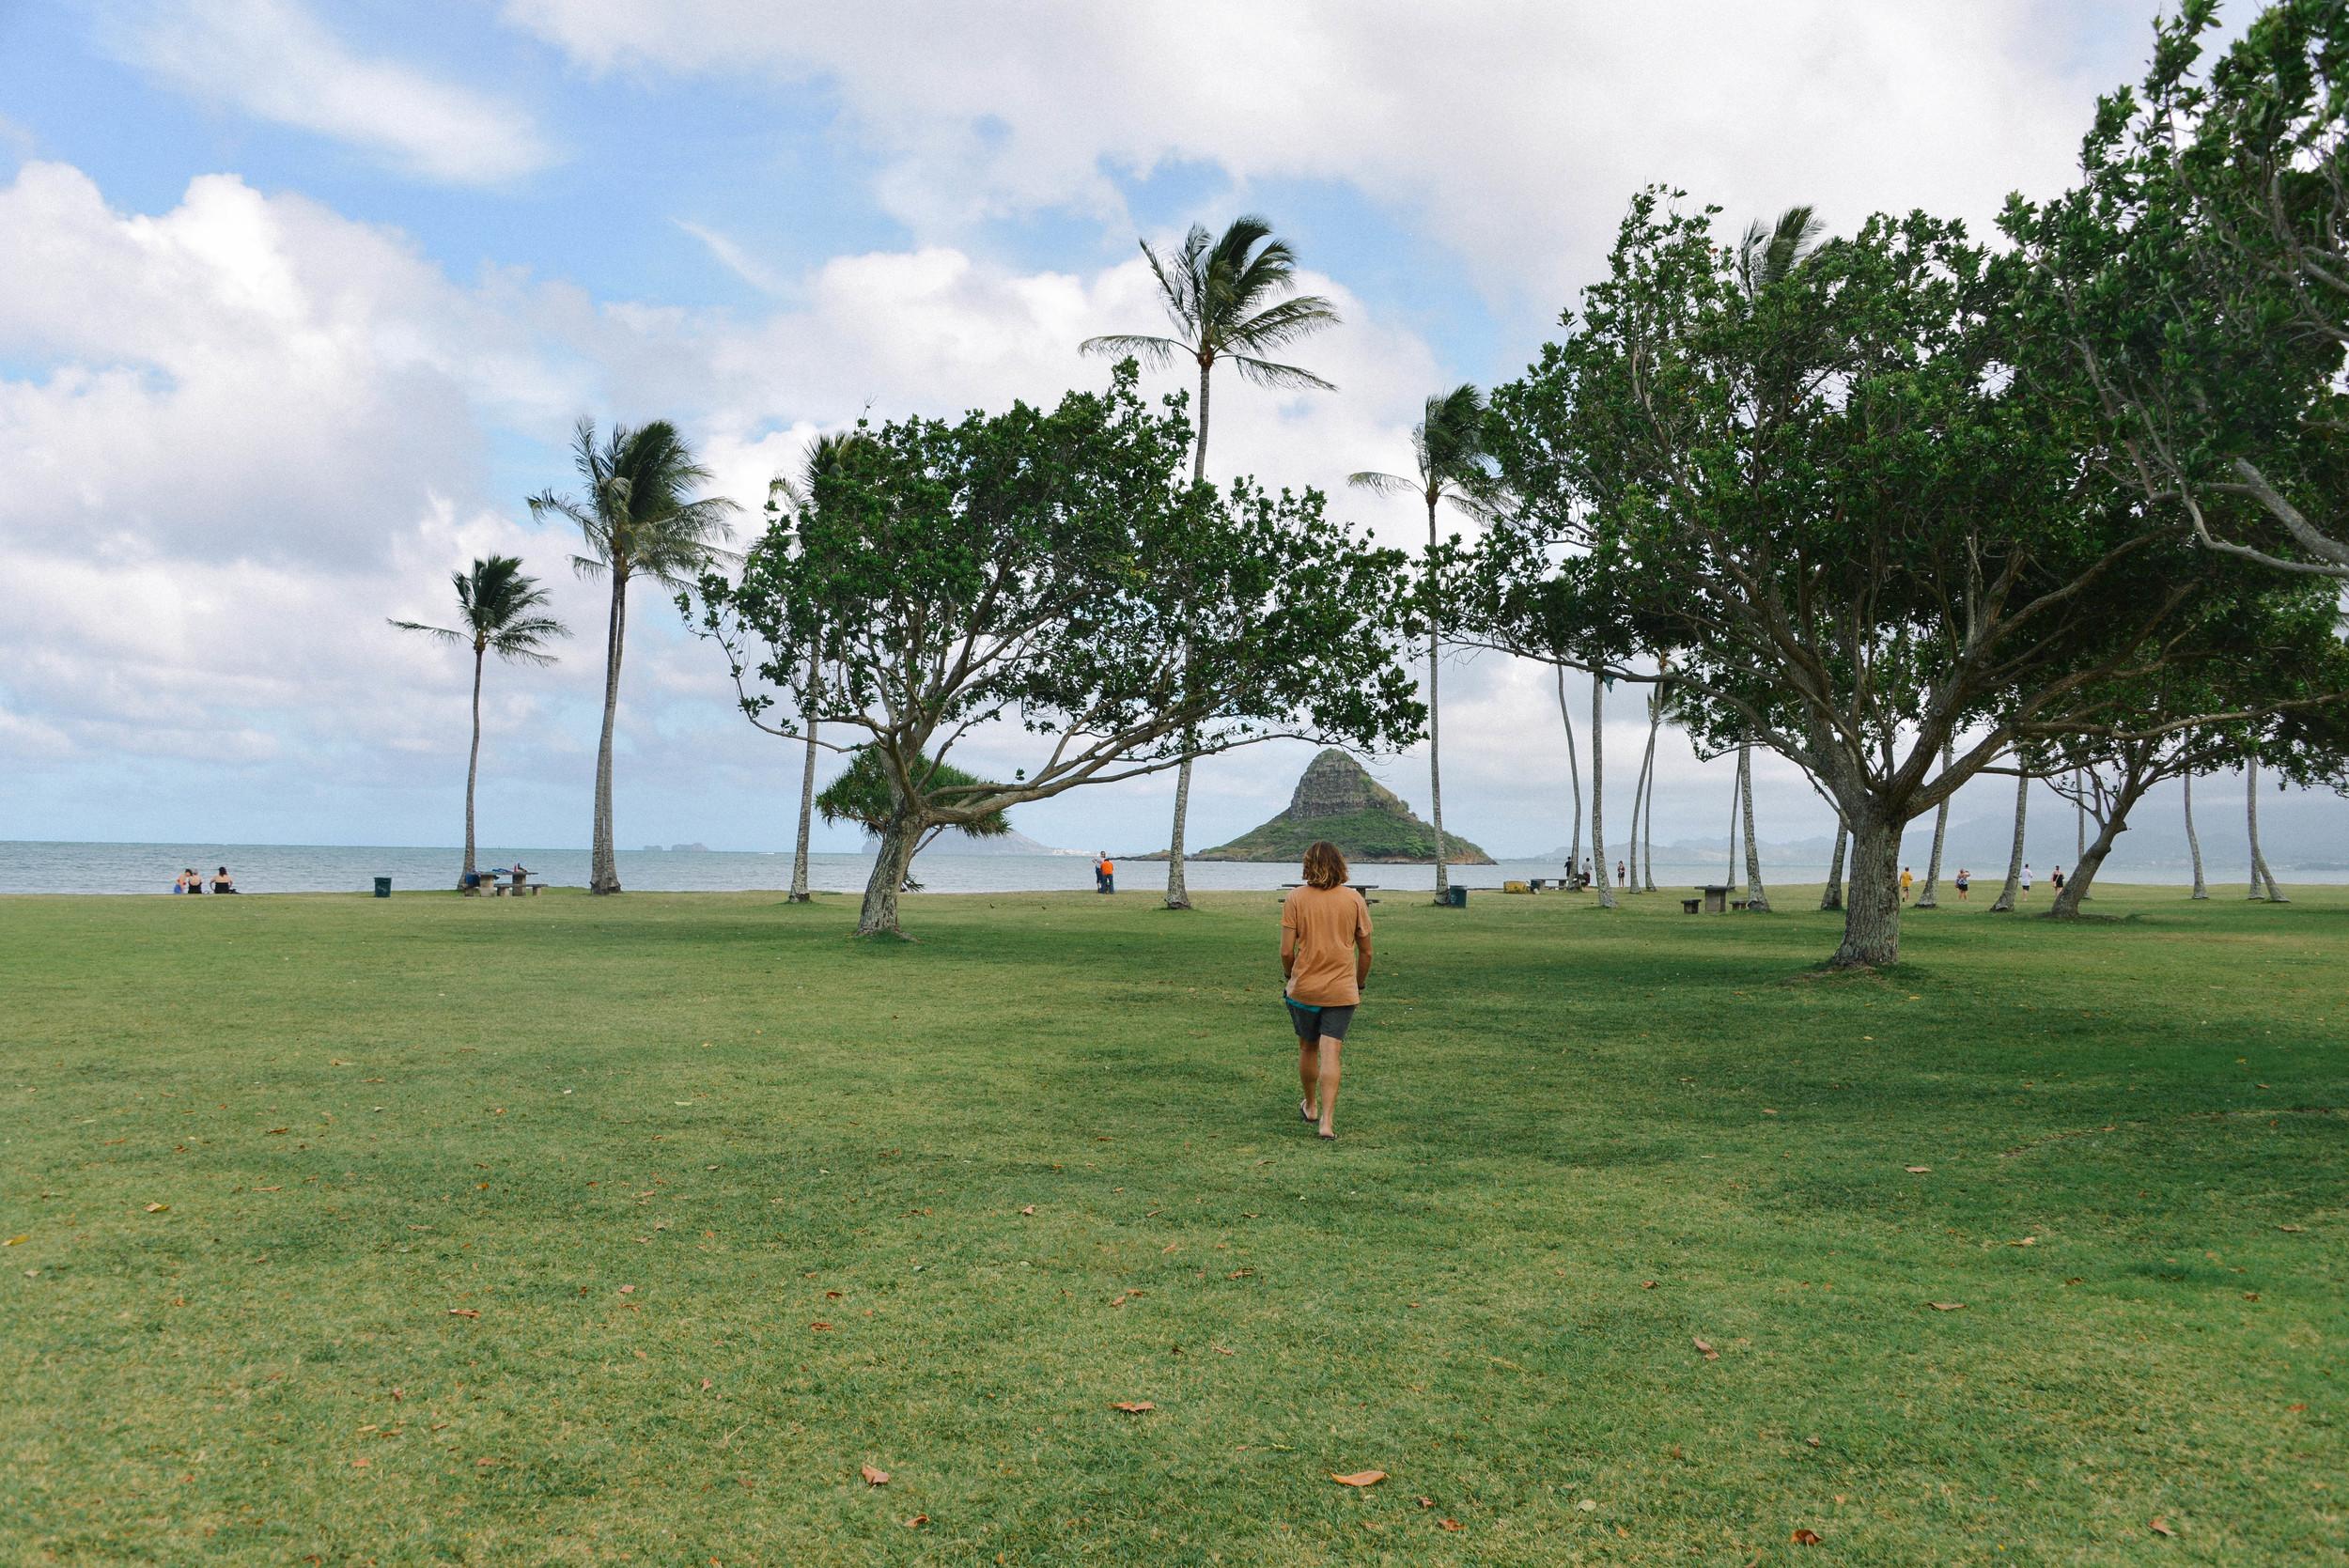 Afternoon walk in Kualoa Park, Oahu.